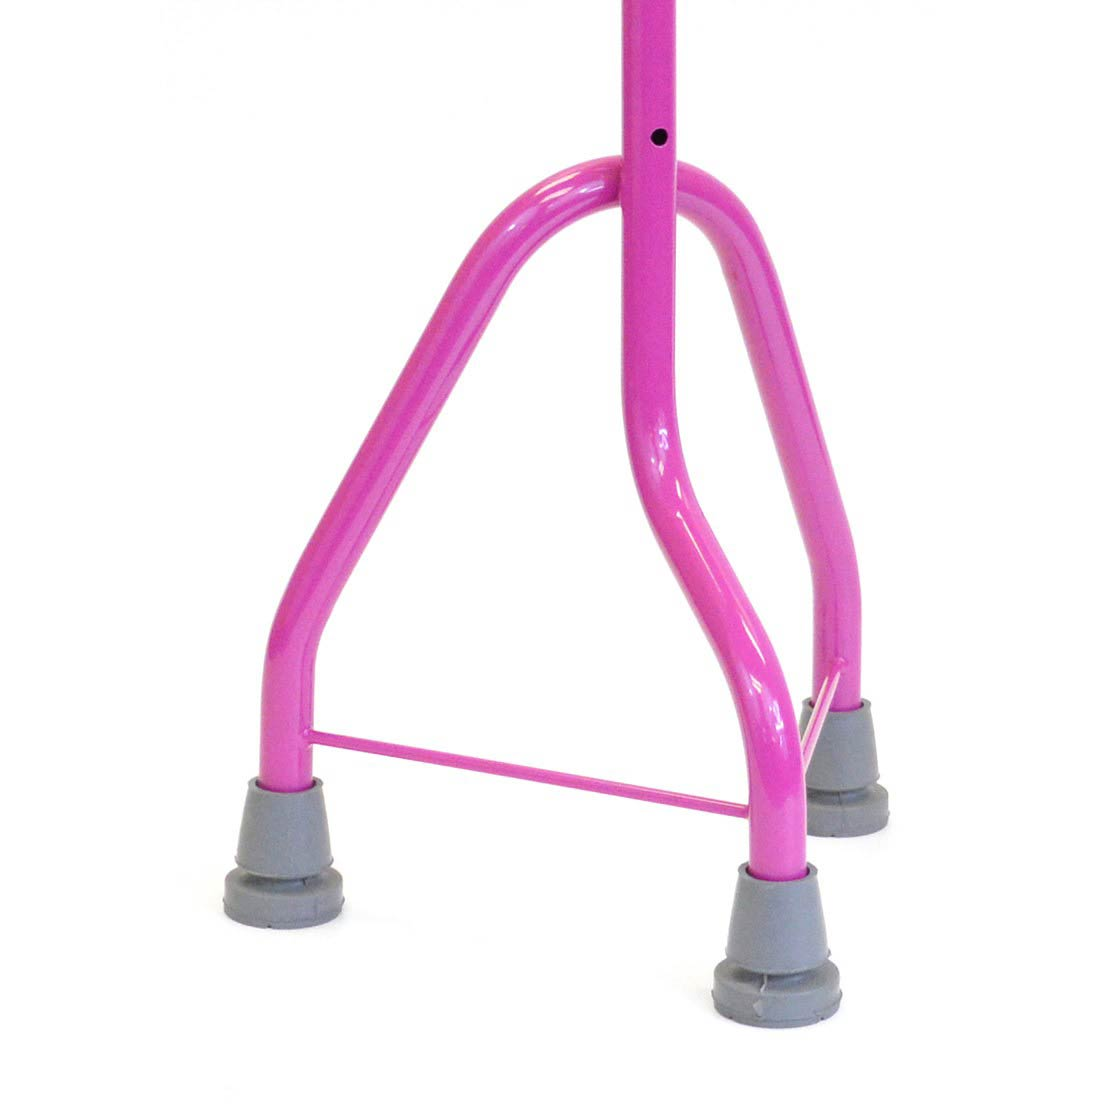 Walk Easy tripod straight neck cane